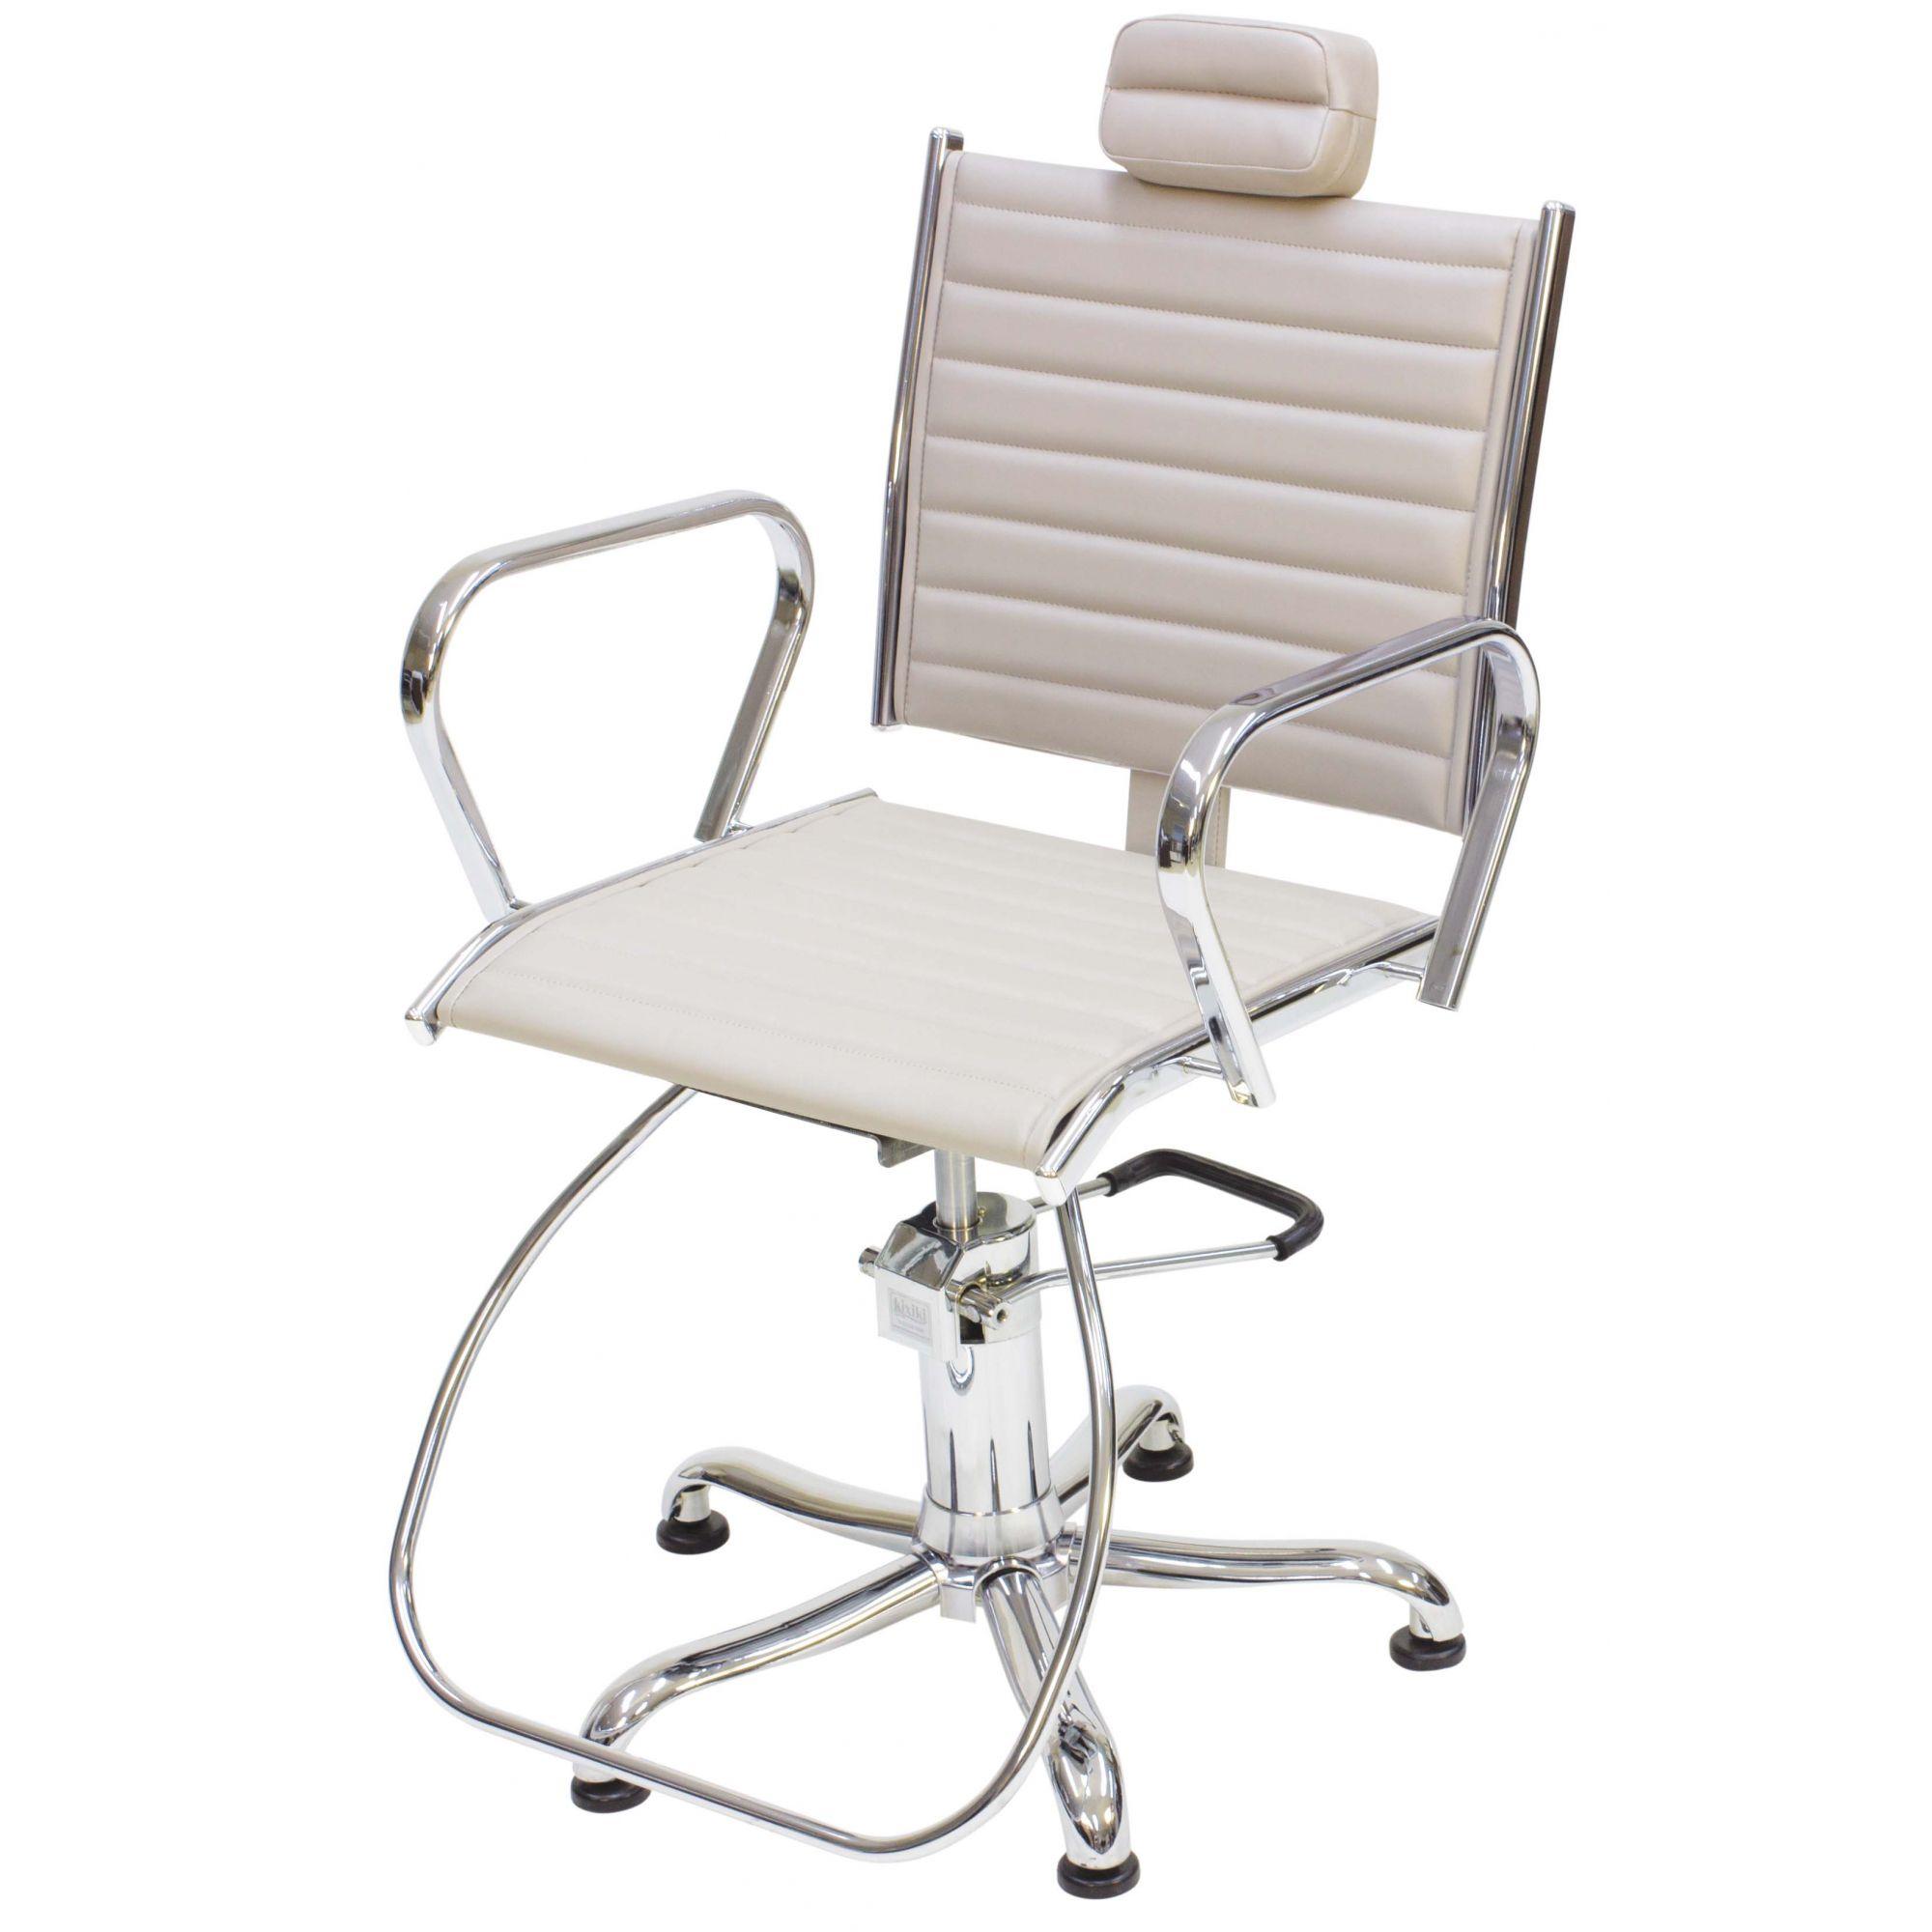 Poltrona Cadeira Kixiki Atenas Reclinável Para Cabeleireiro